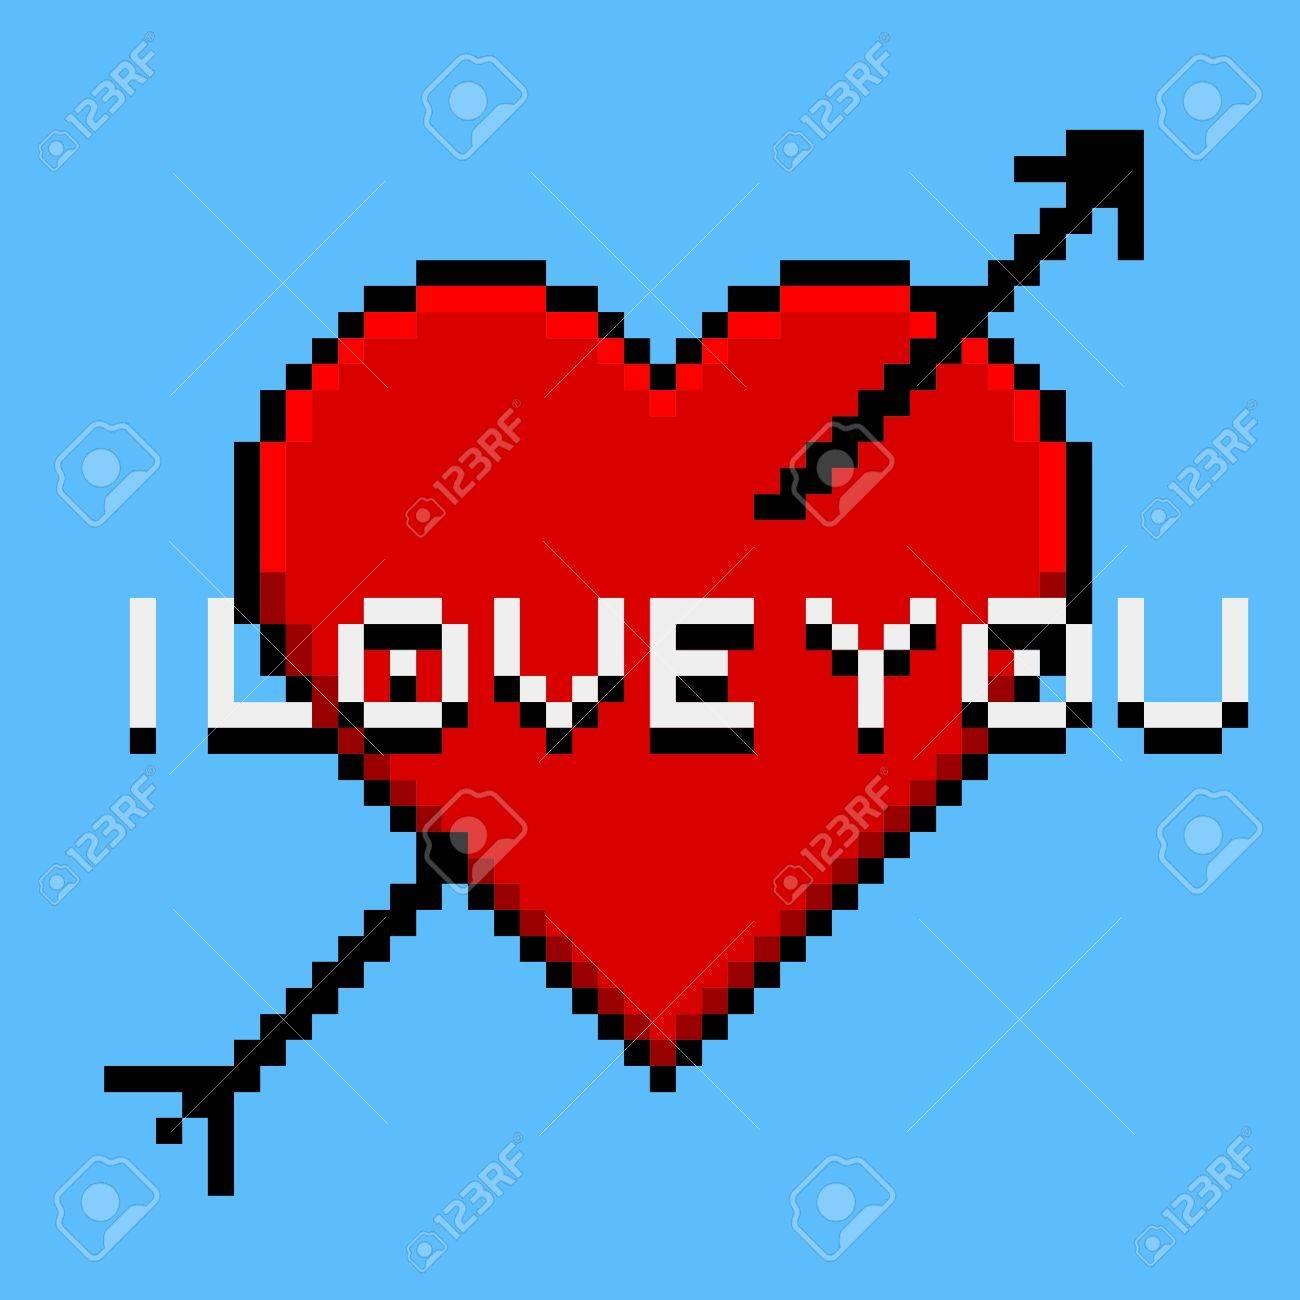 Pixel Art Coeur I Love You